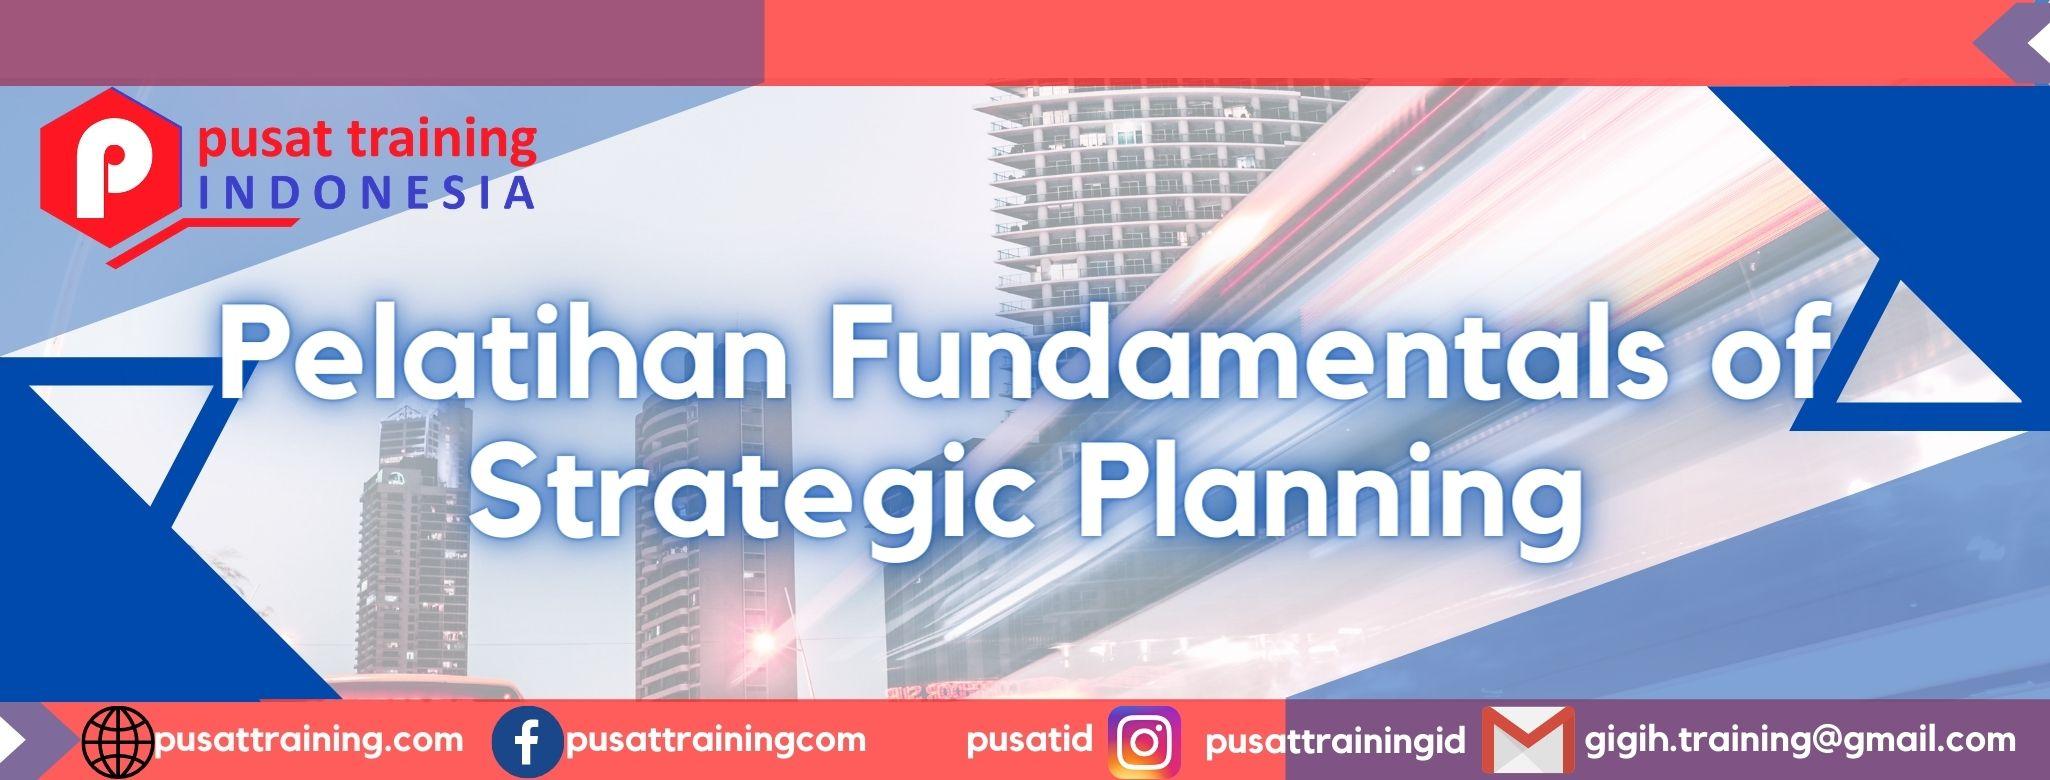 Pelatihan-Fundamentals-of-Strategic-Planning